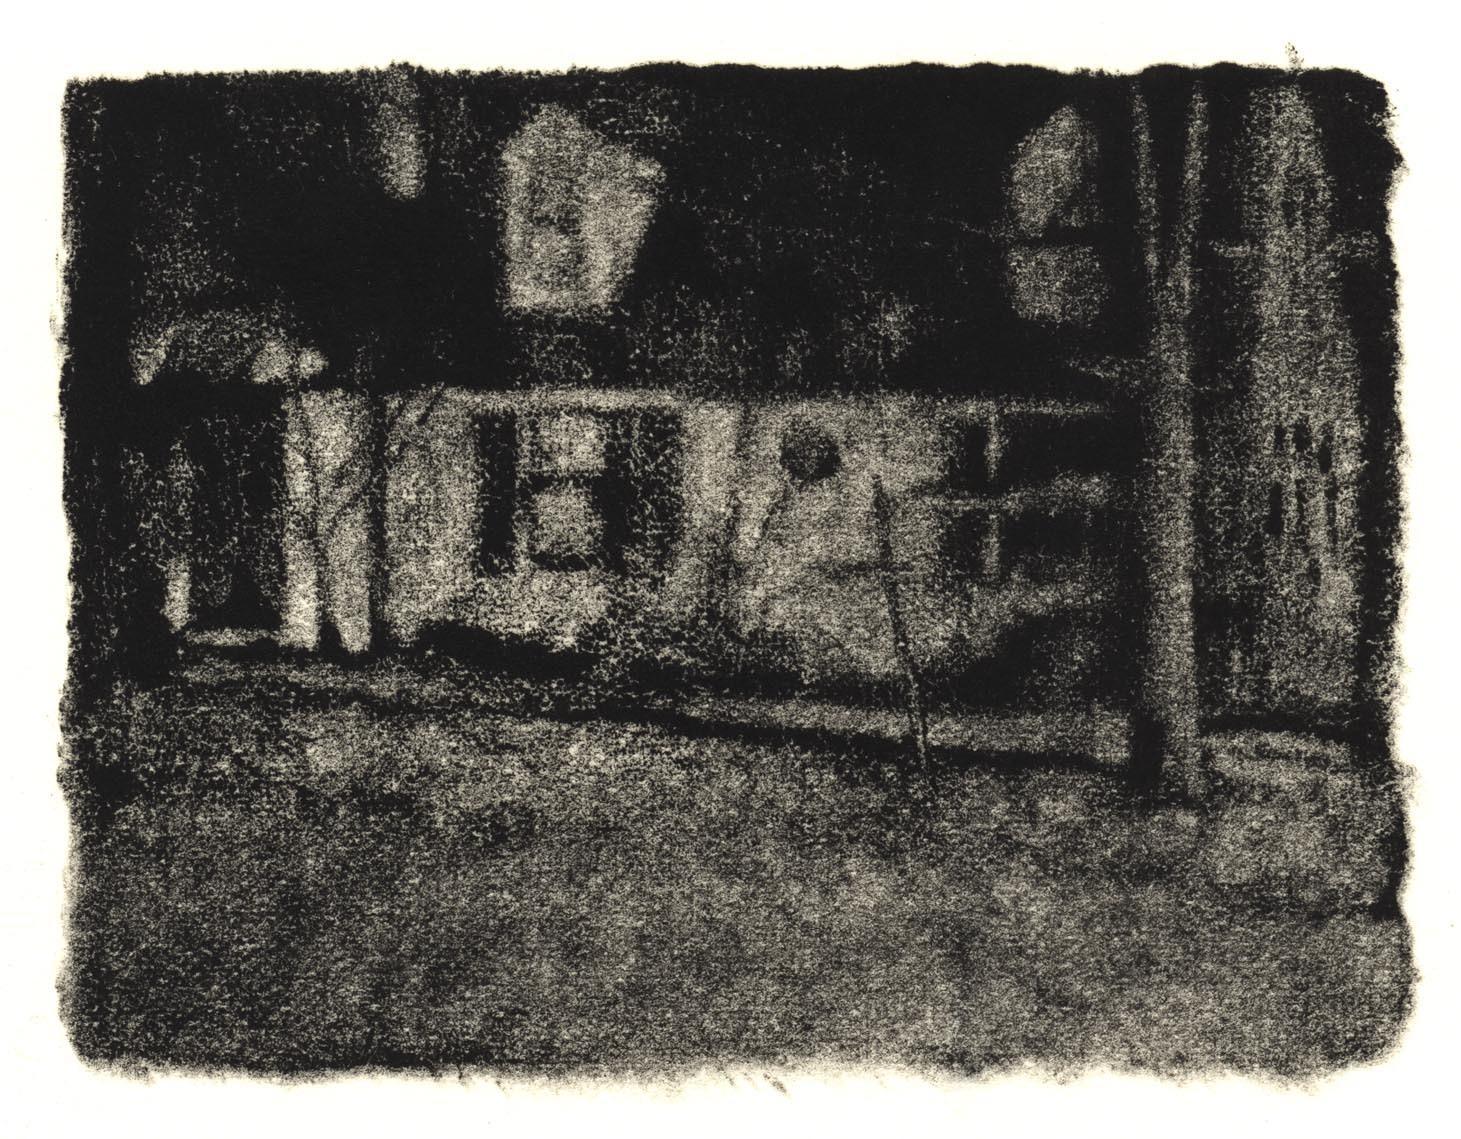 Dark House: Fall image